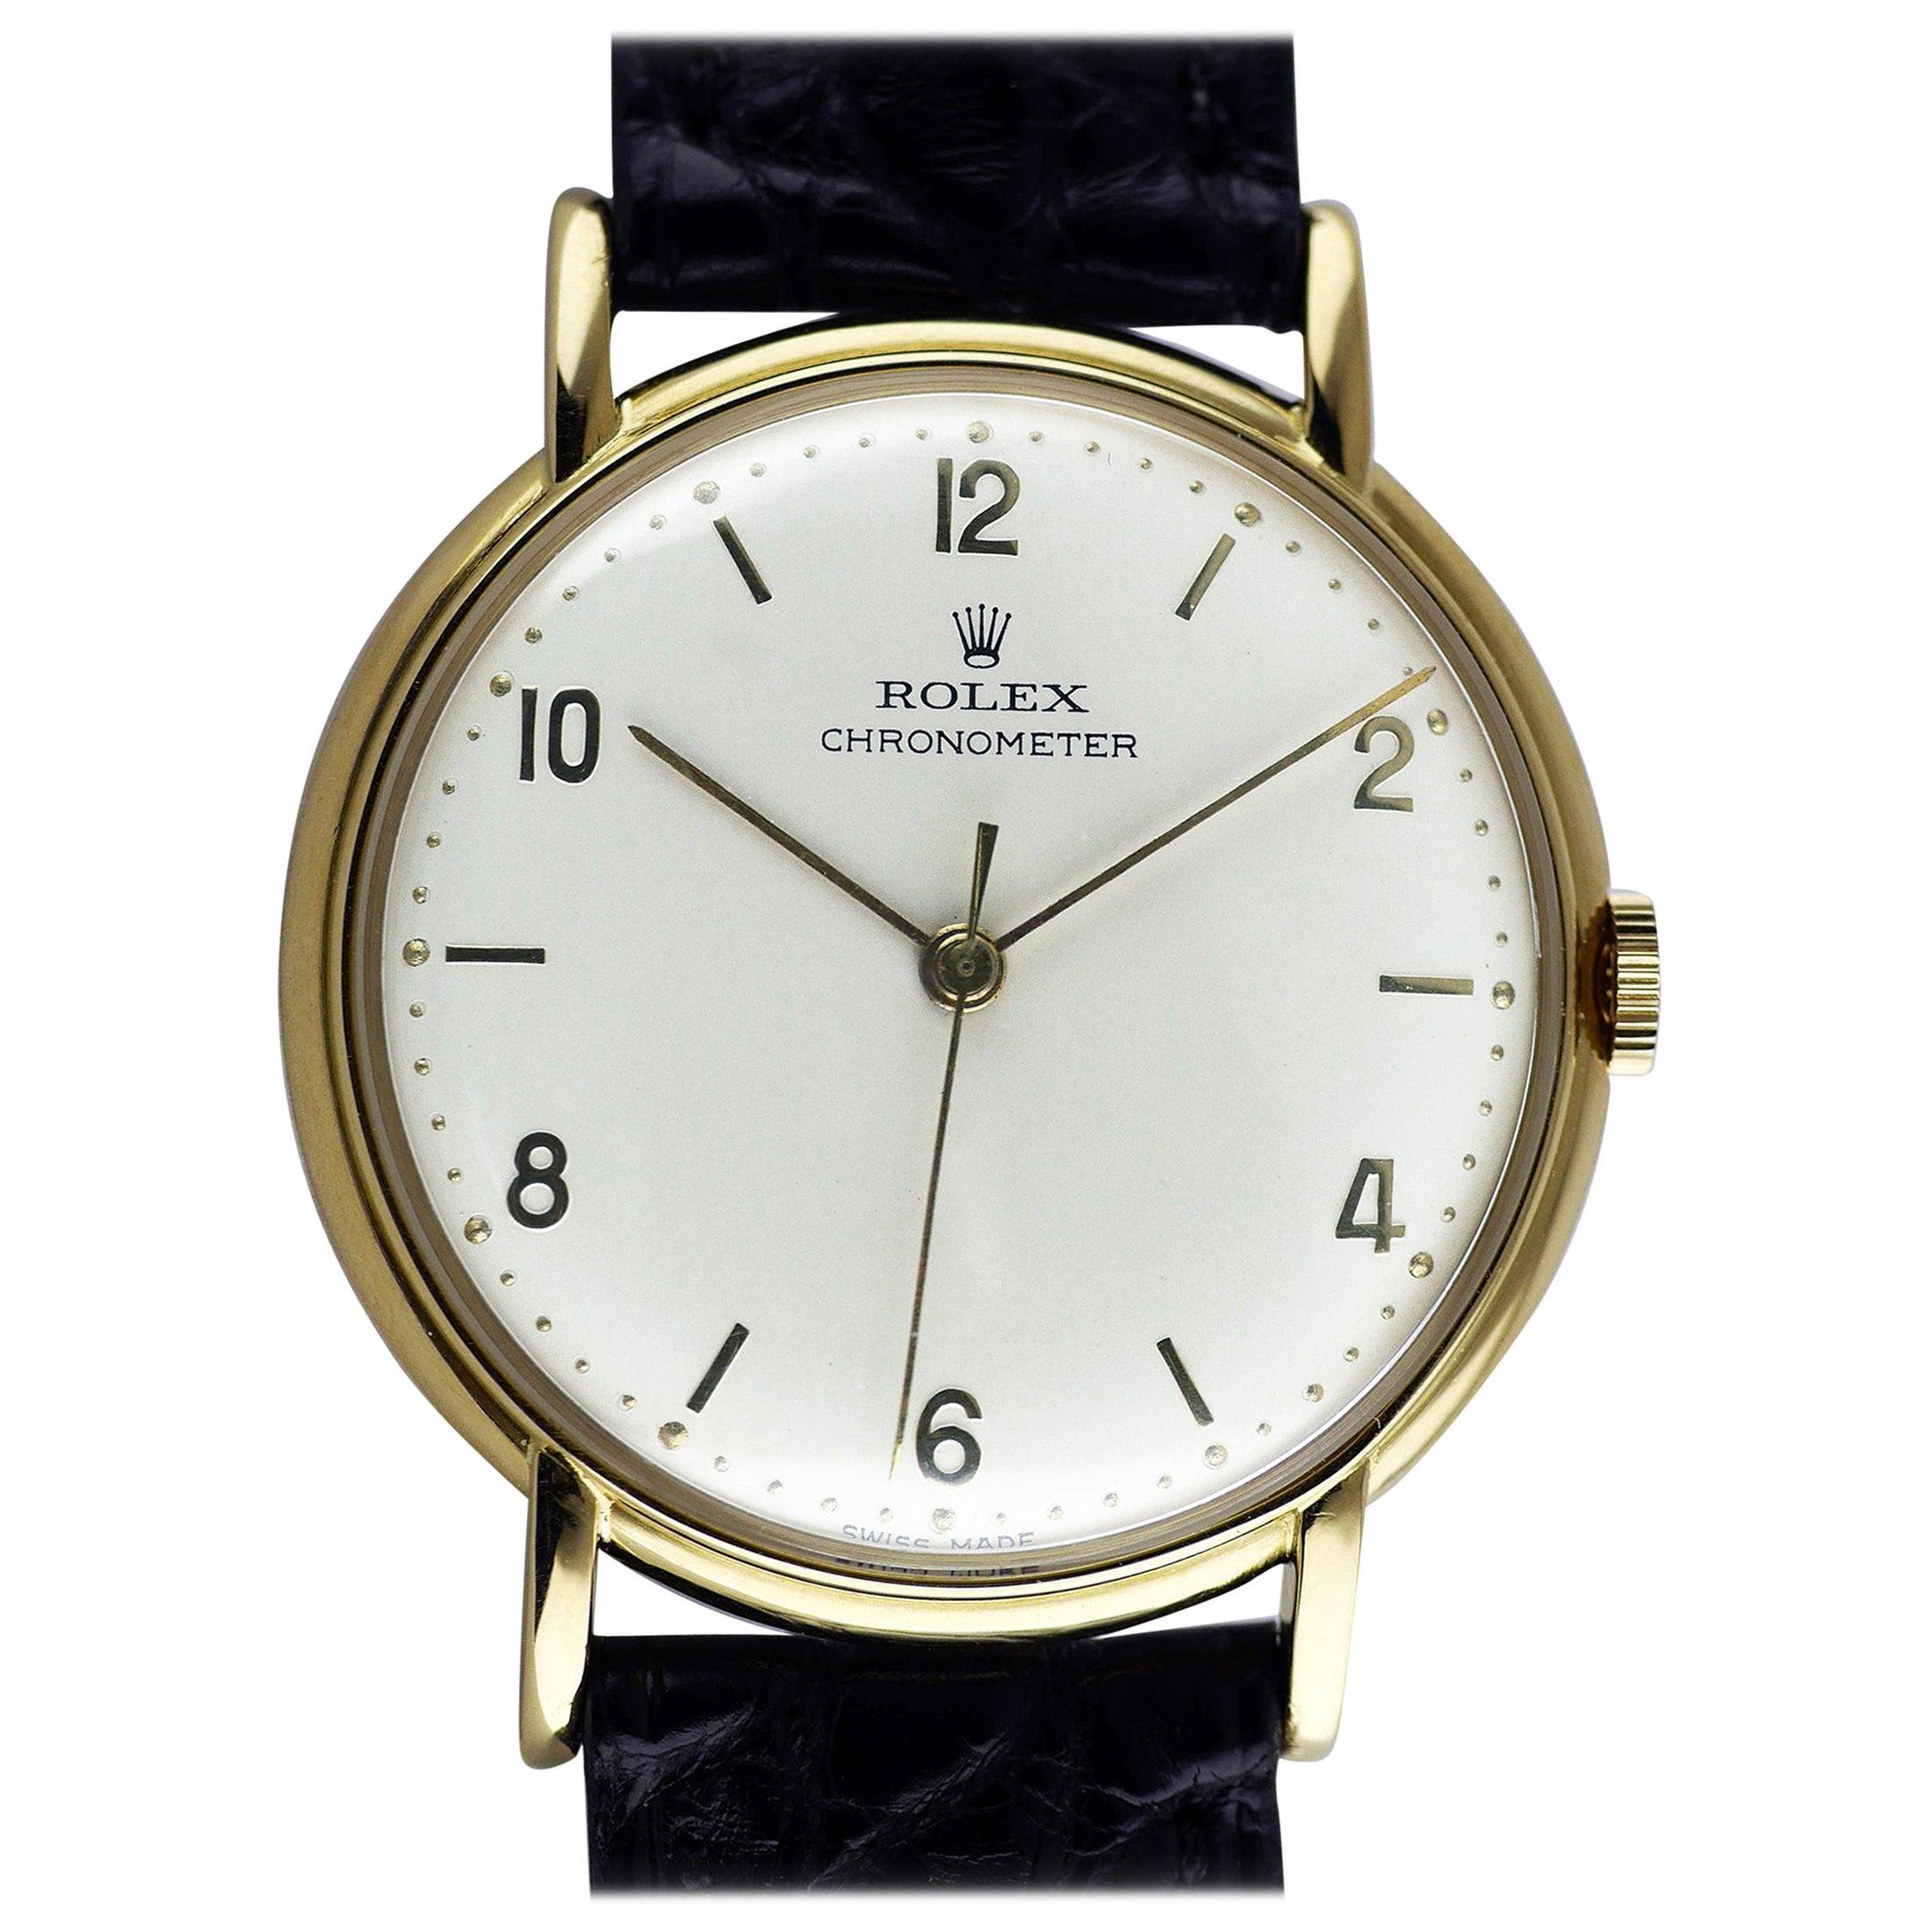 Rolex Precision Gold Wristwatch, 1948